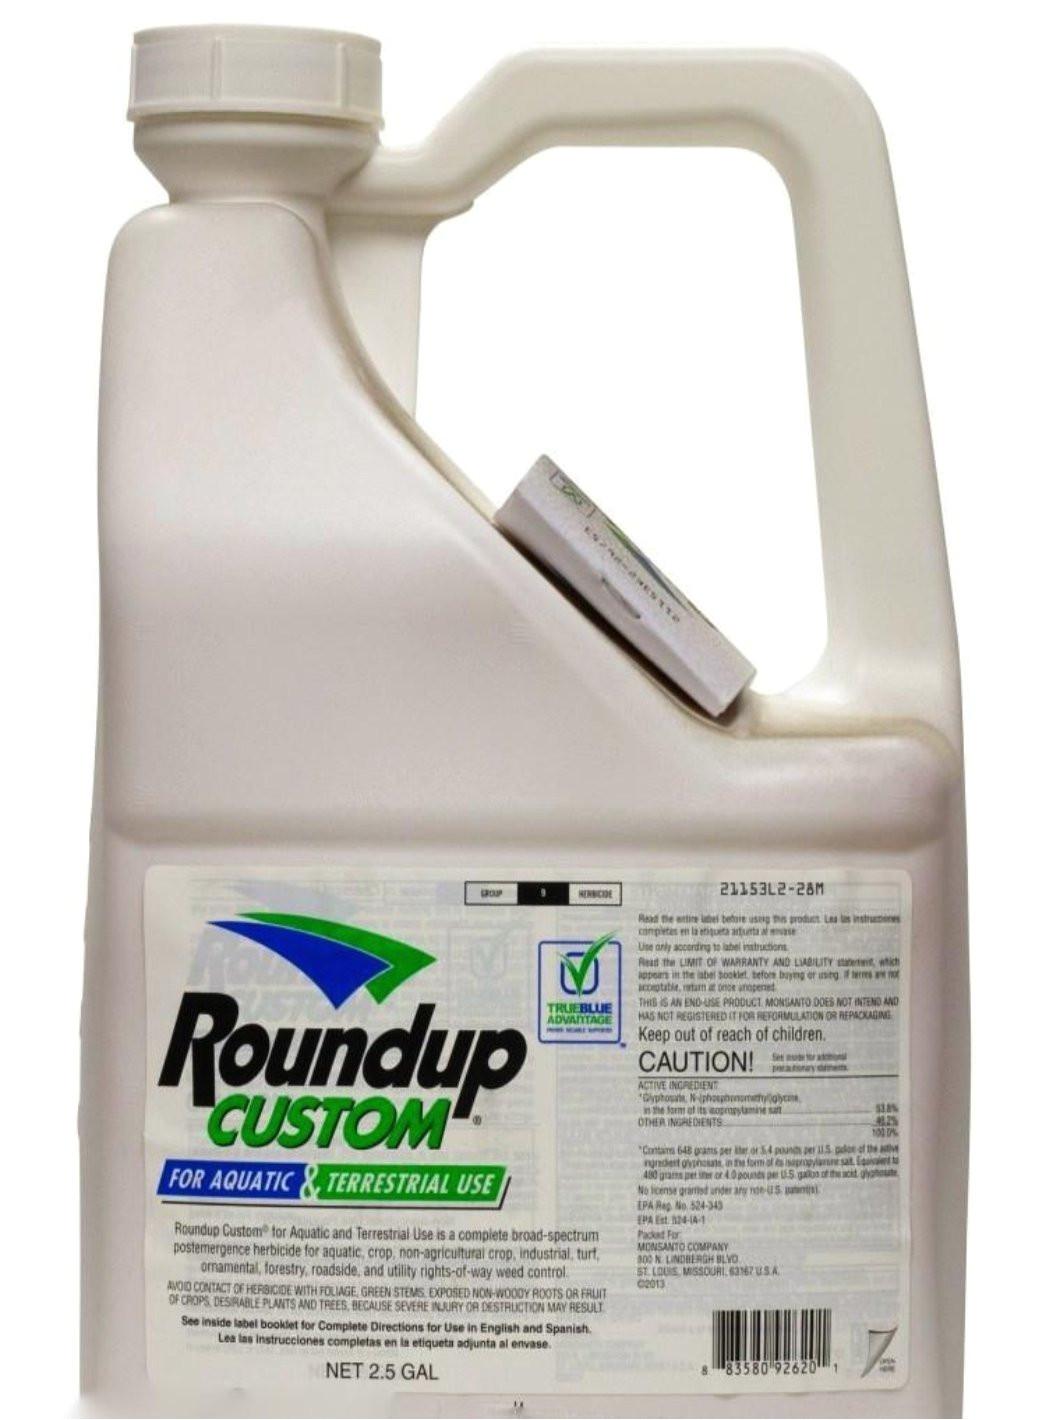 herbicide roundup custom aquatic and terrestrial weed killer herbicide